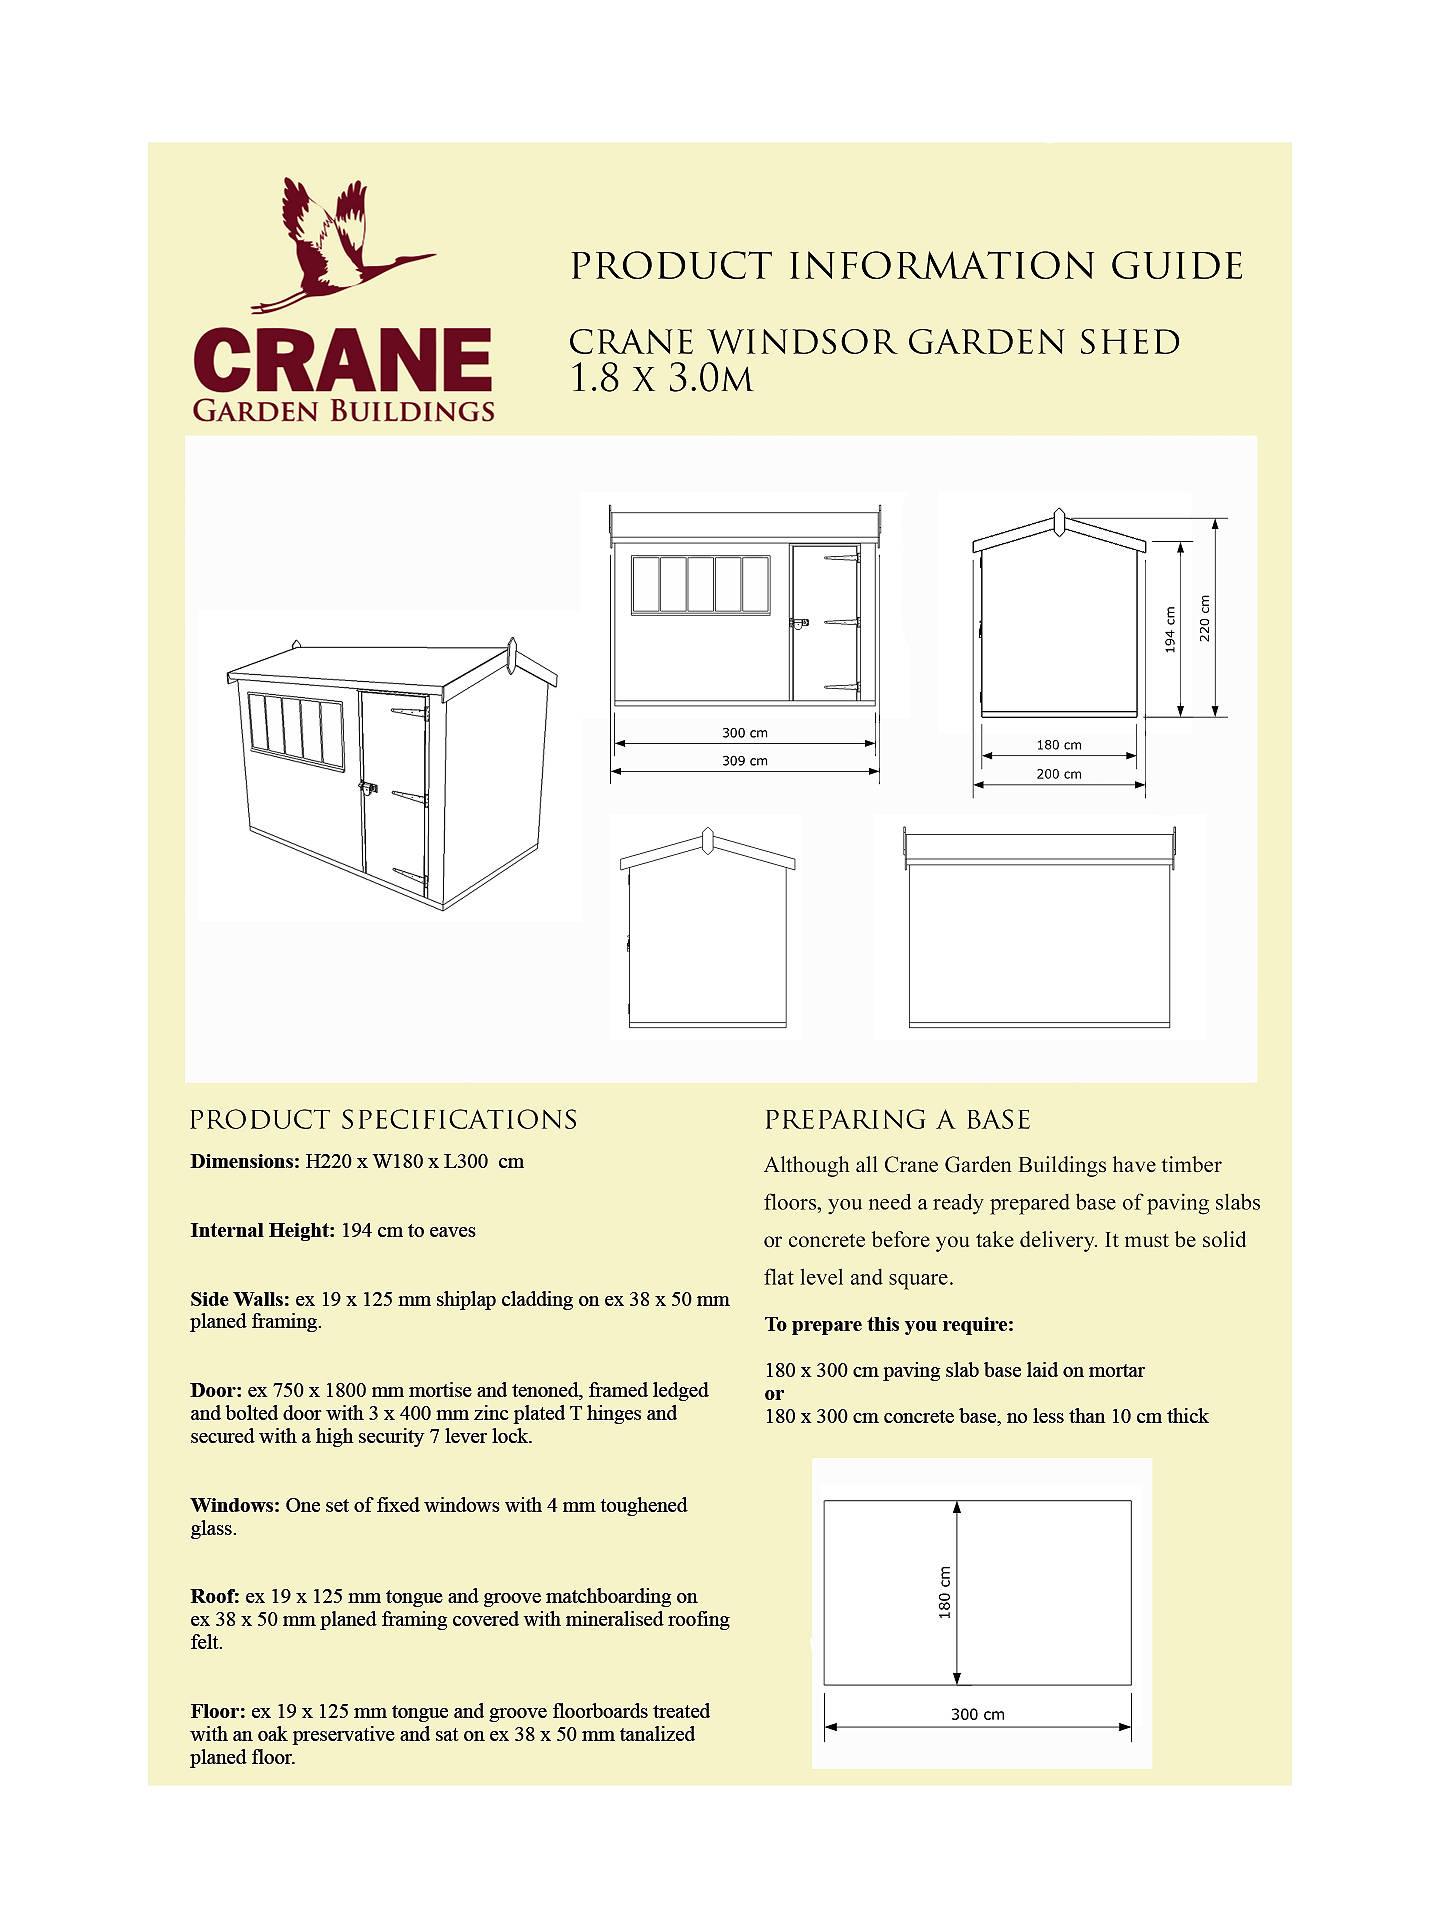 Crane 1 8 x 3m Windsor Garden Shed, FSC-certified (Scandinavian Redwood),  Sage